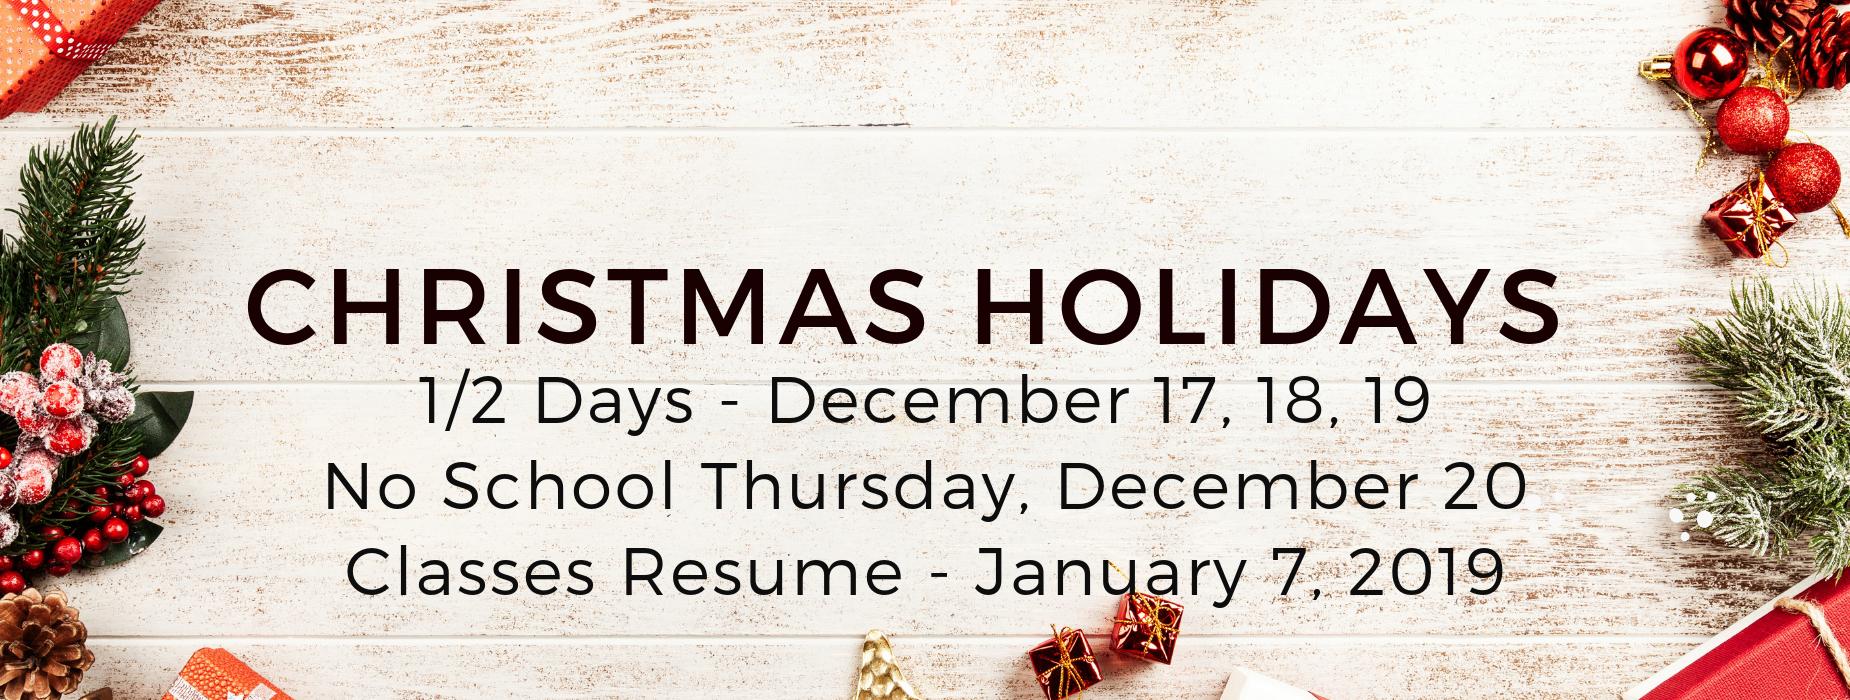 christmas holidays 1/2 days dec. 17, 18, 19 no school december 20. classes resume jan. 7, 2019